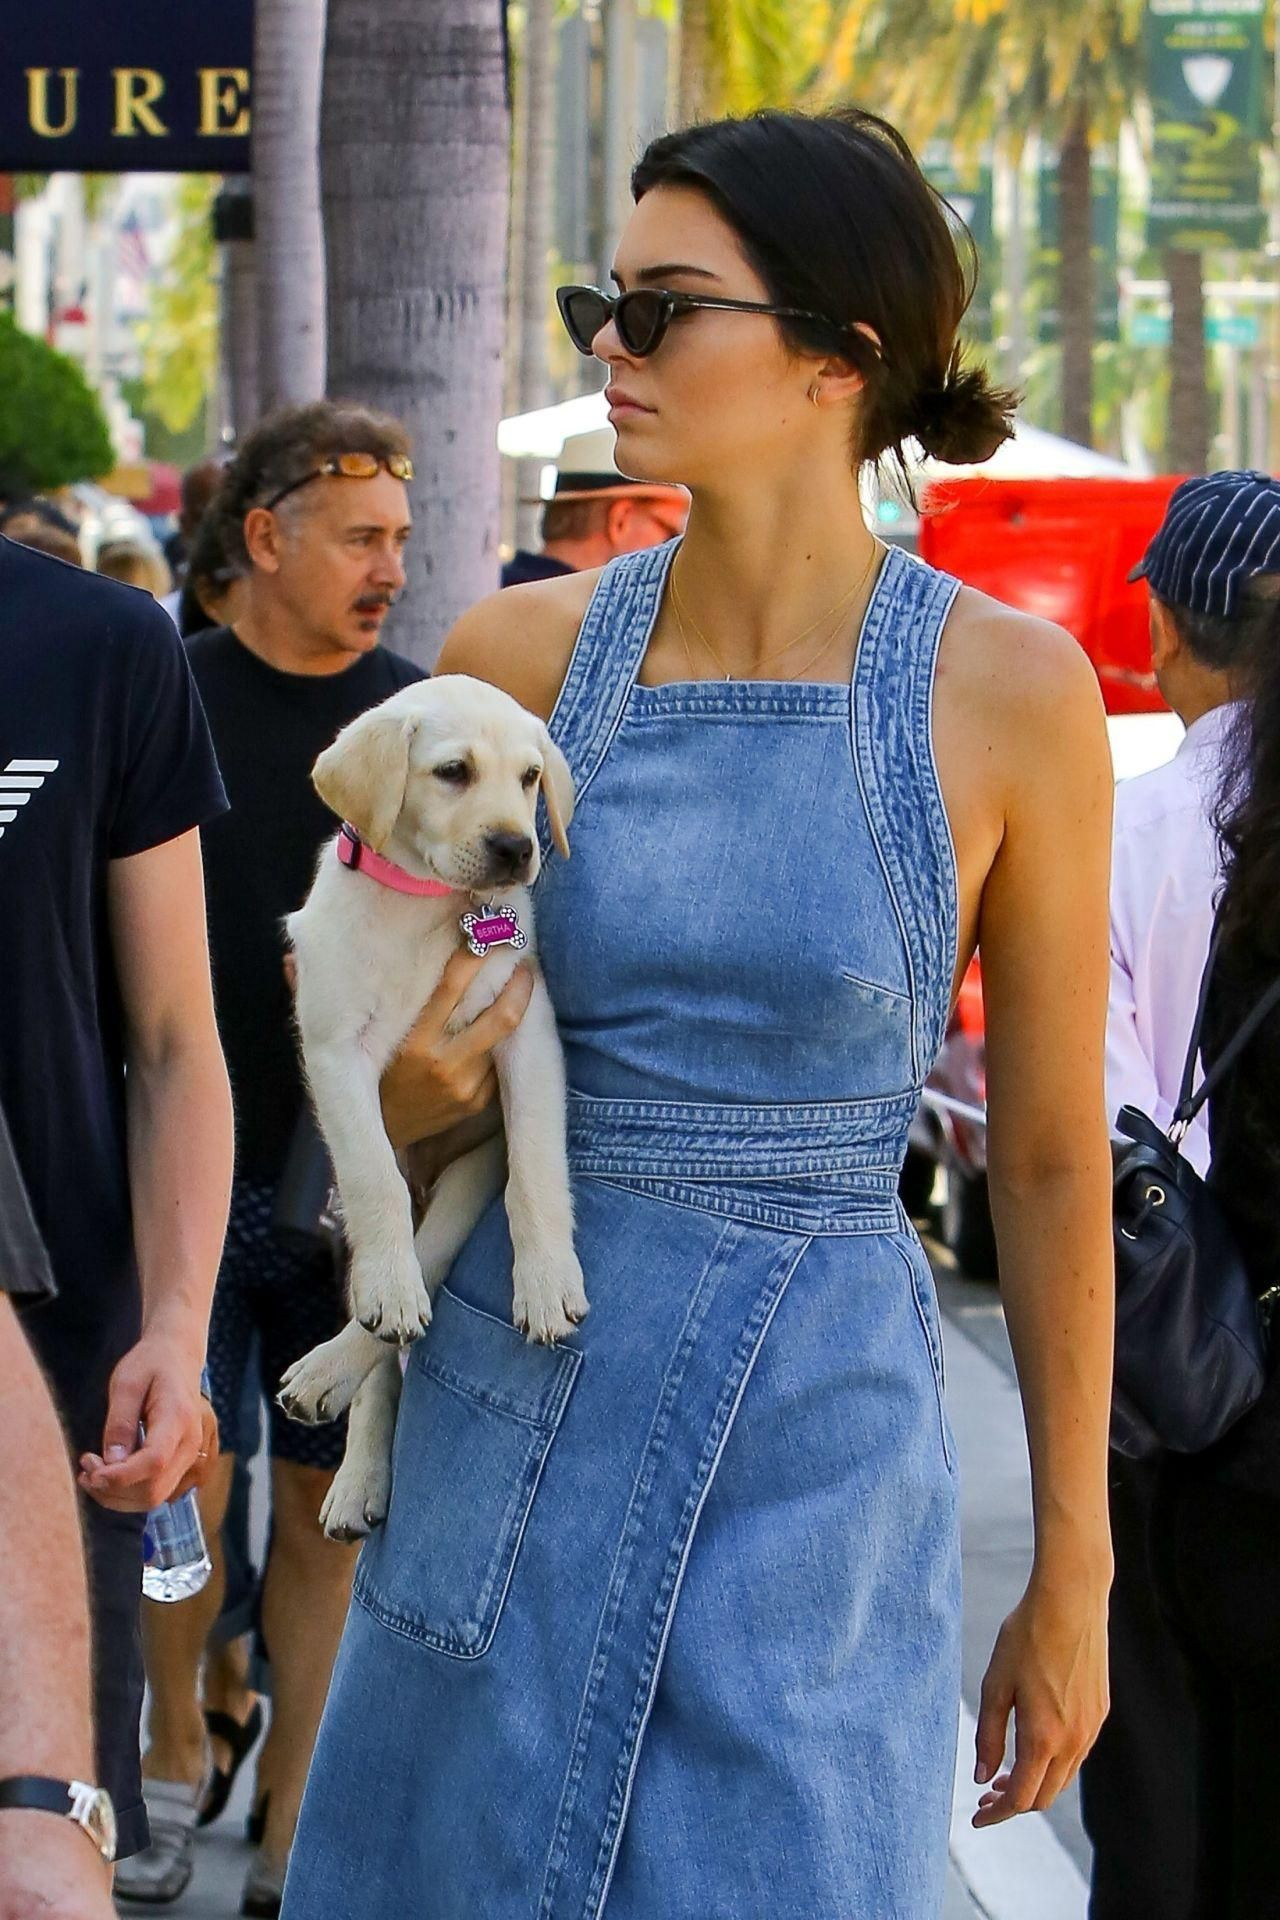 Kendall Jenner walking with her cute dog Bertha in a denim dress ...